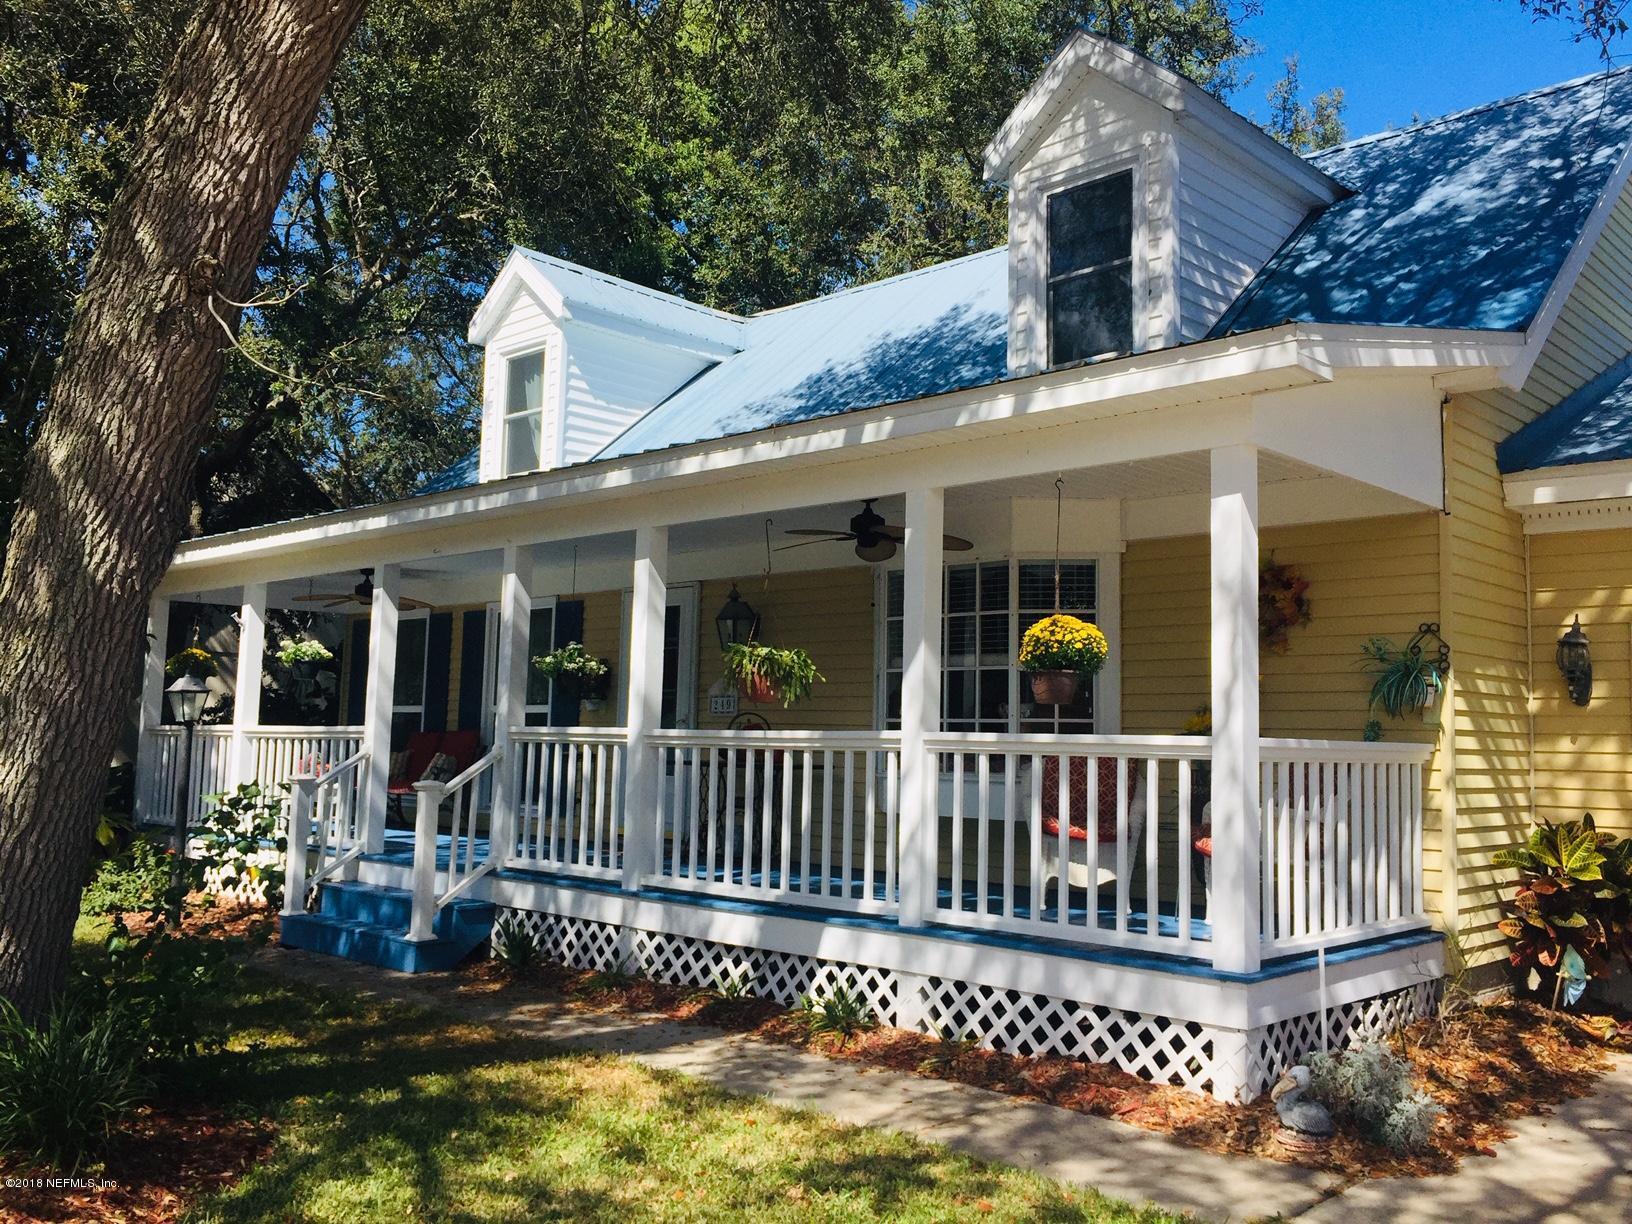 249 BONITA, ST AUGUSTINE, FLORIDA 32086, 4 Bedrooms Bedrooms, ,2 BathroomsBathrooms,Residential - single family,For sale,BONITA,959618